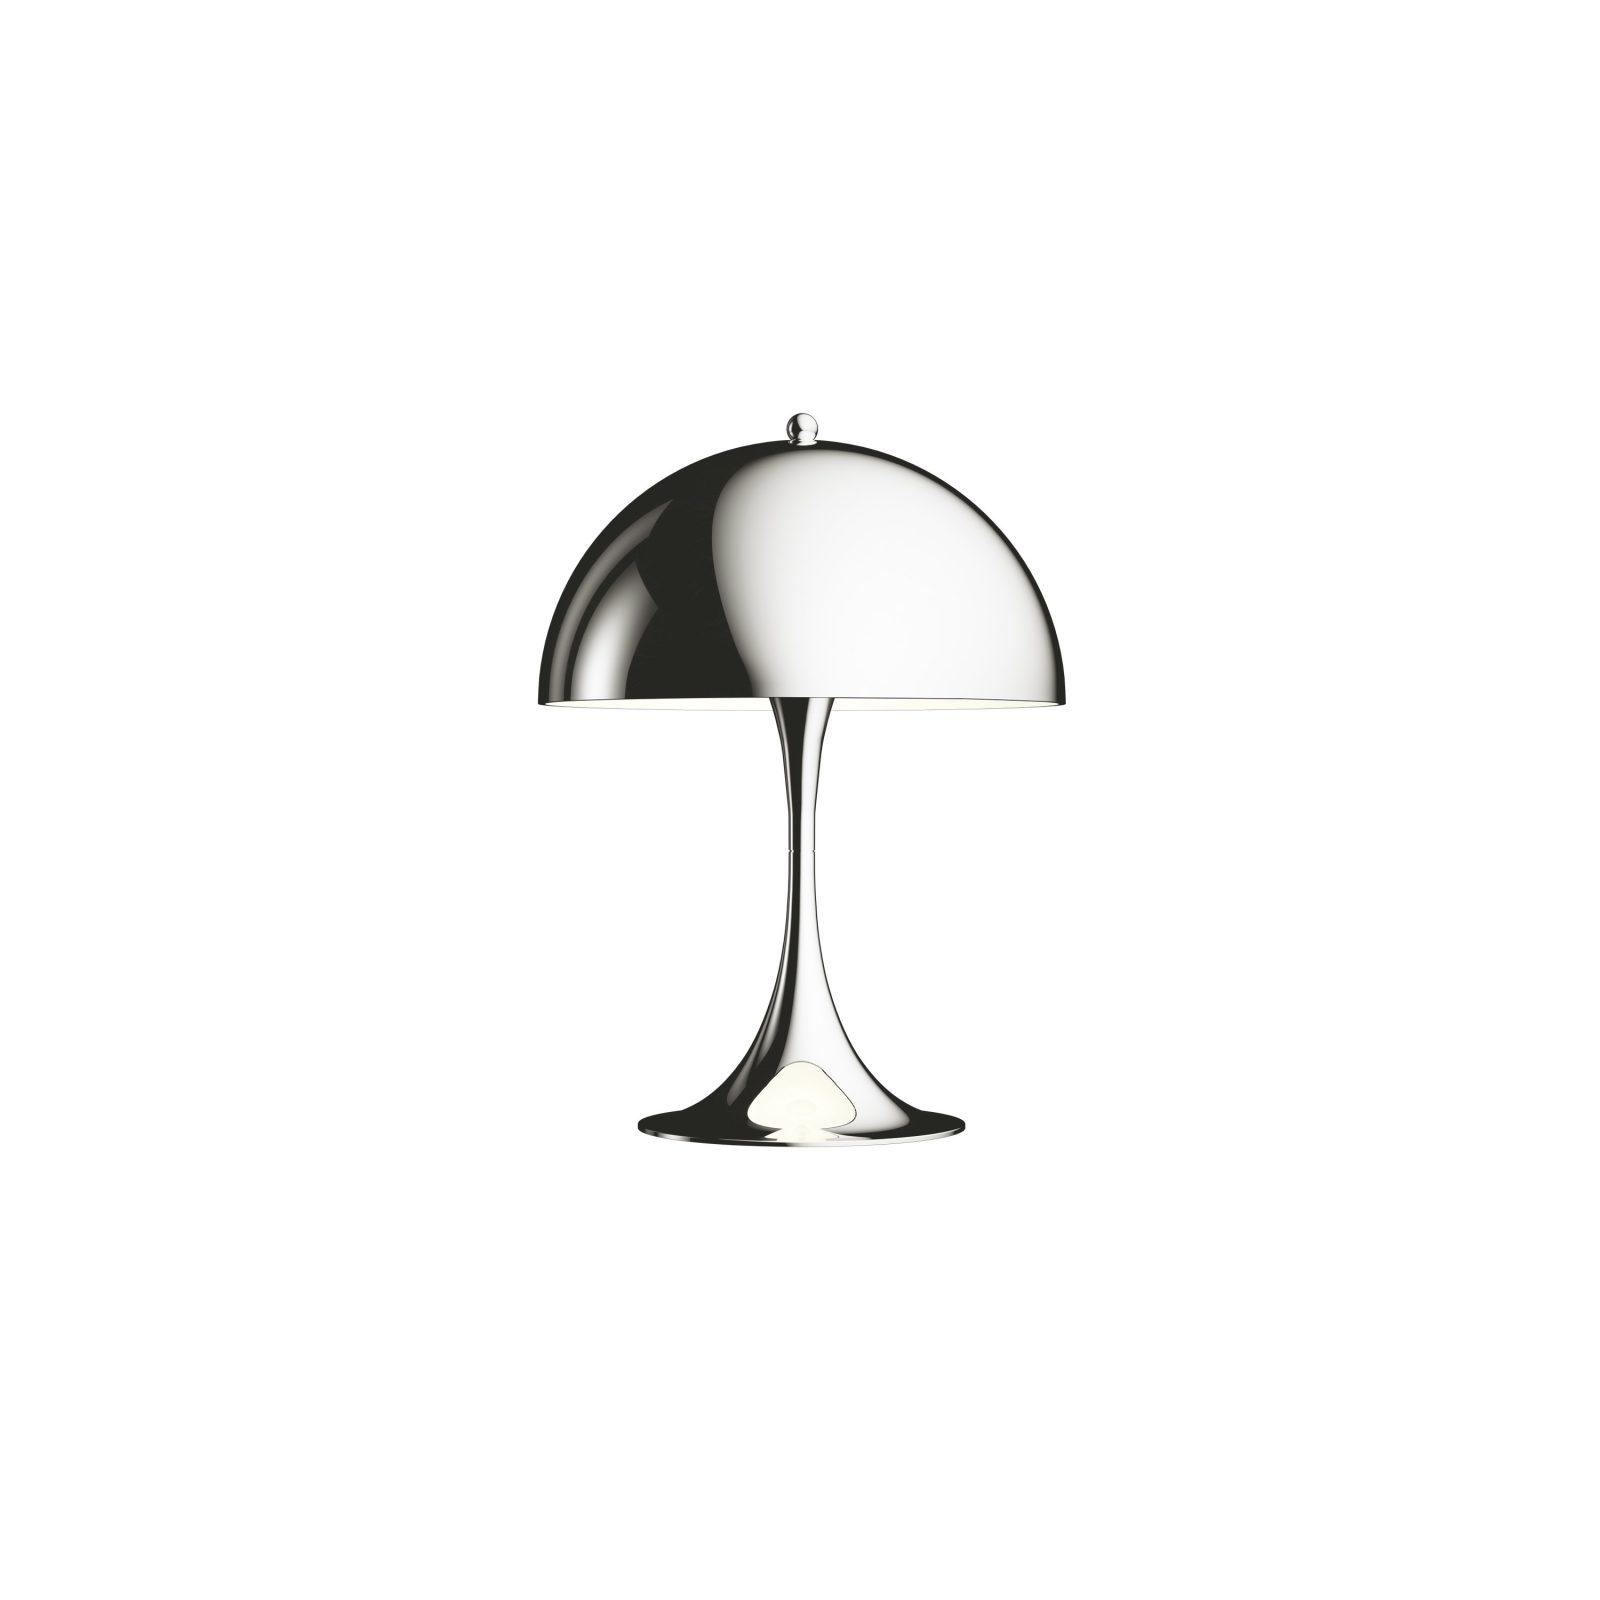 Louis poulsen panthella mini table lamp now available at nordic louis poulsen panthella mini table lamp aloadofball Choice Image